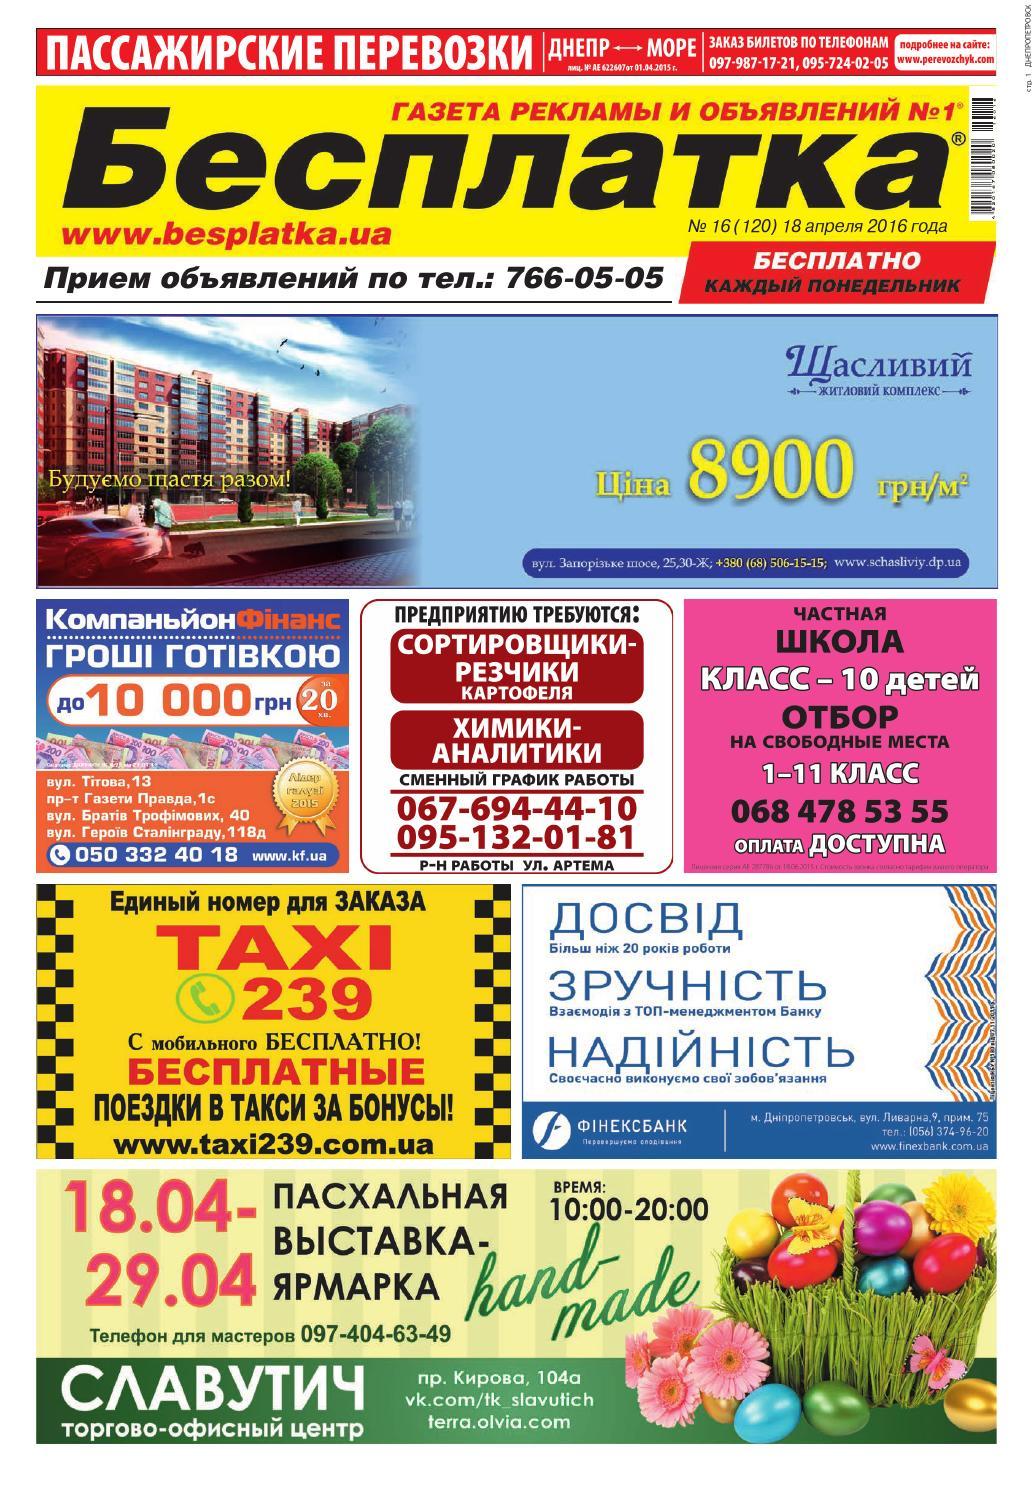 Besplatka  16 Днепропетровск by besplatka ukraine - issuu f8710fc818b